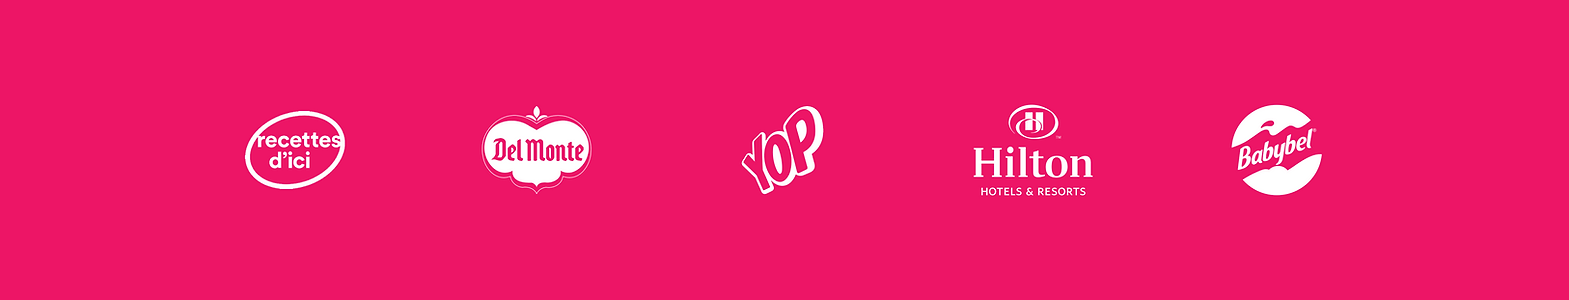 LOGOS_TIKTOK – 1.png